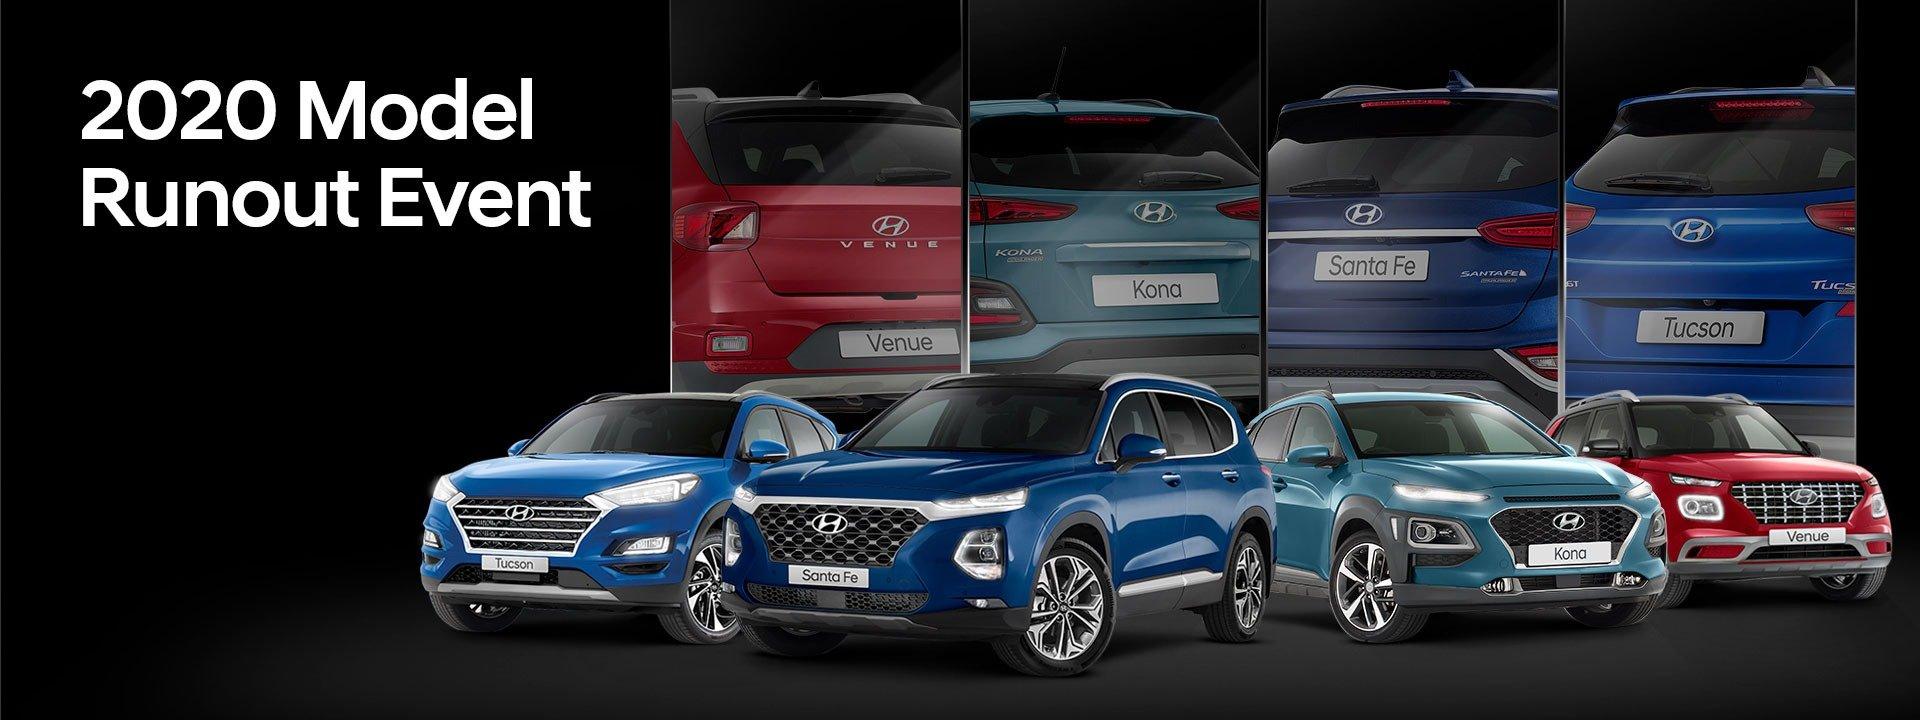 Hyundai-Special-Offers-Mandurah-Hyundai